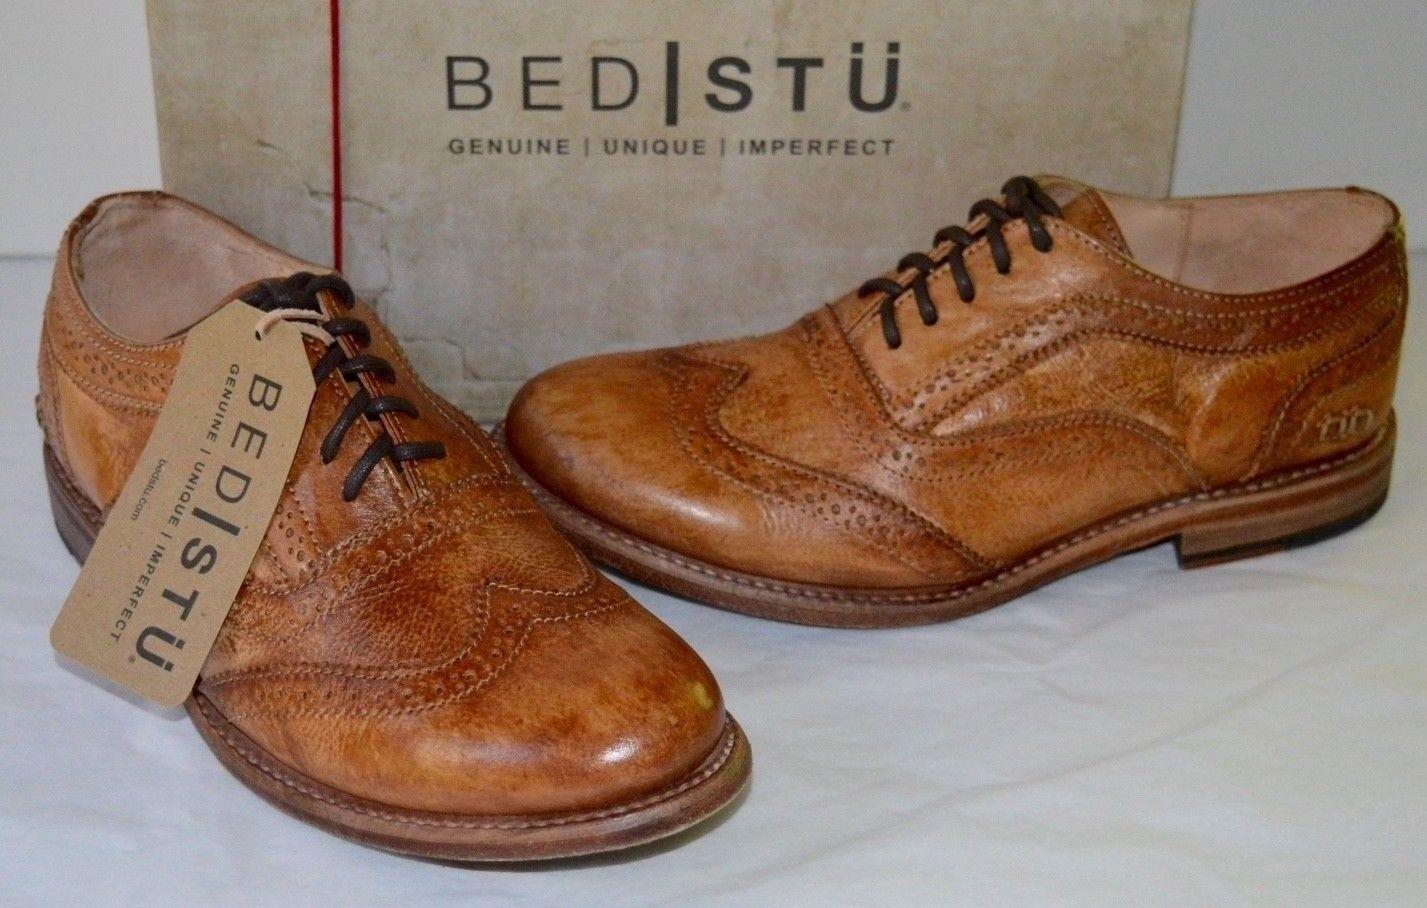 New Bed Stu Lita Oxford Wingtips Tan Brown Driftwood Vintage Leather Cobbler